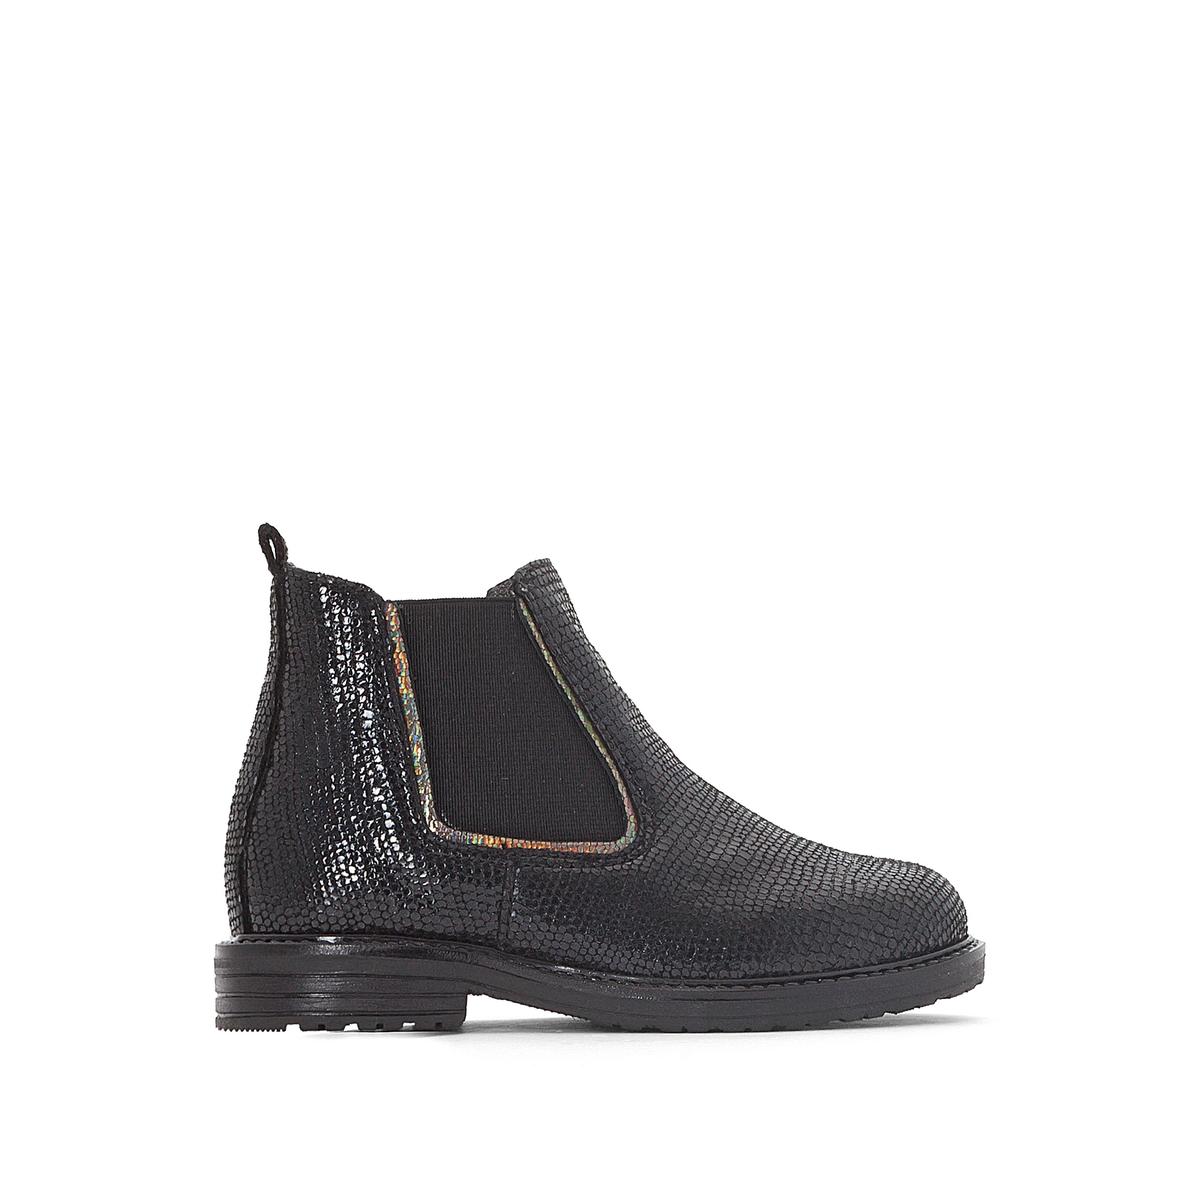 Ботинки-челси кожаные Salouna